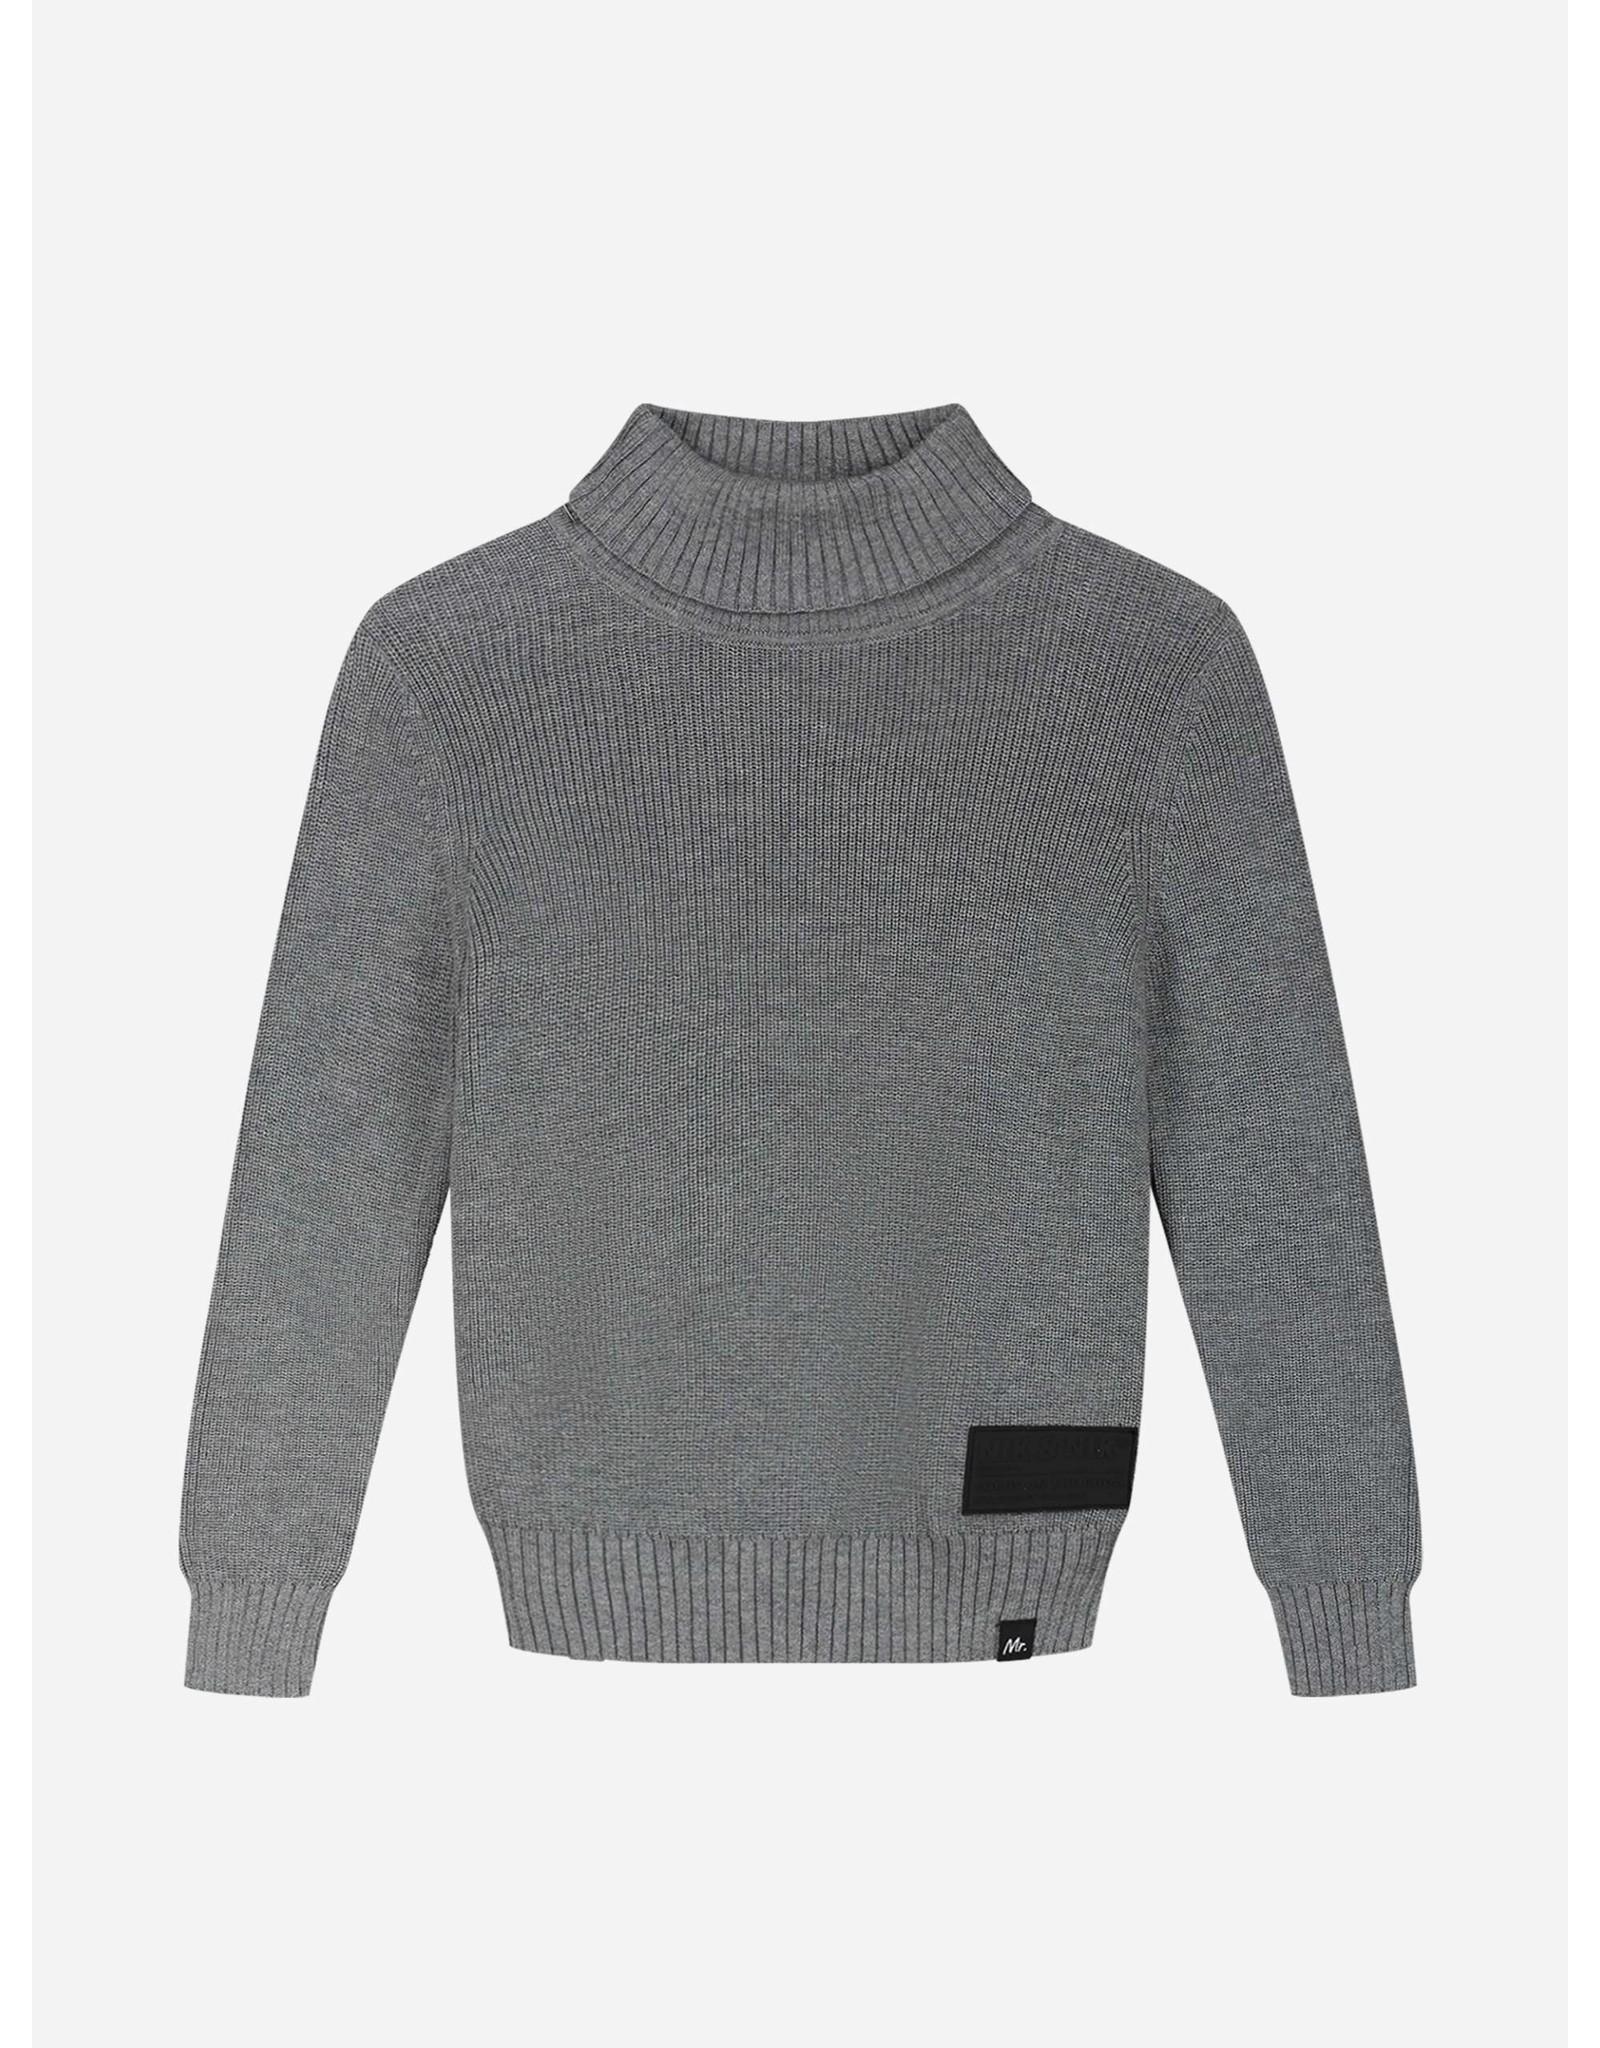 Nik&Nik NIK&NIK Hos Pullover Medium Grey Melange